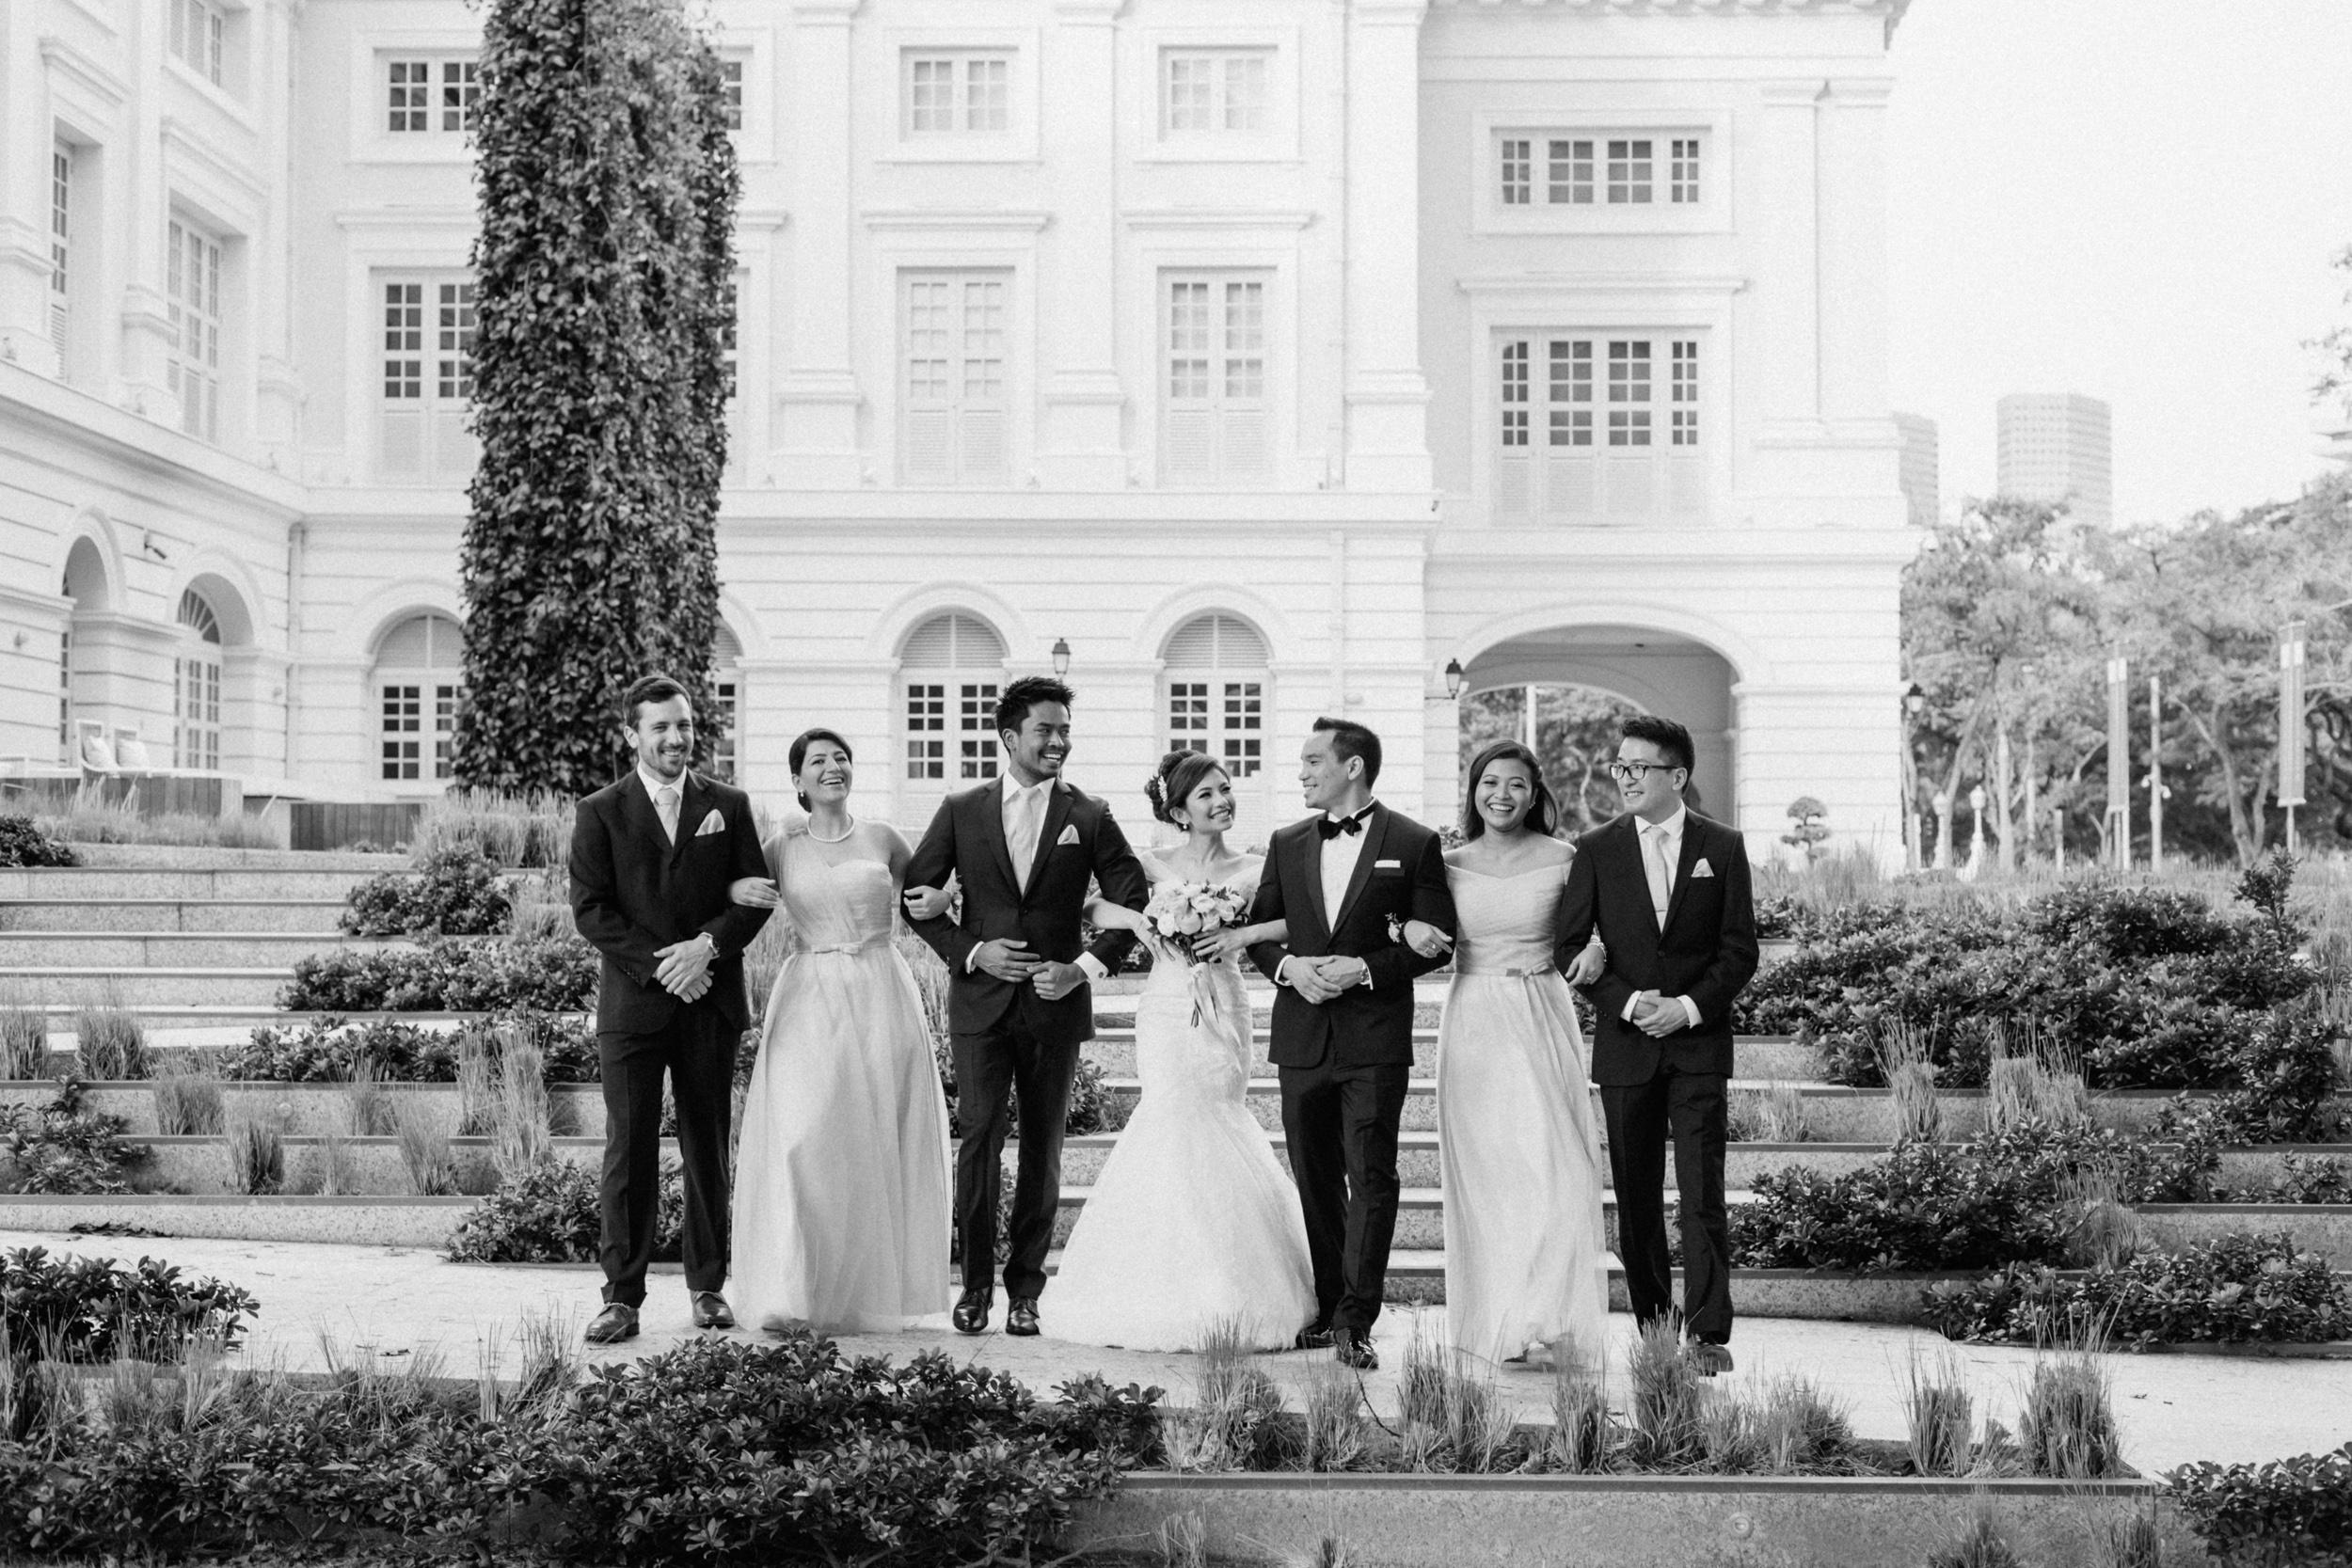 singapore-wedding-photographer-cheryl-matthew-fullerton-hotel-wedding-45.jpg